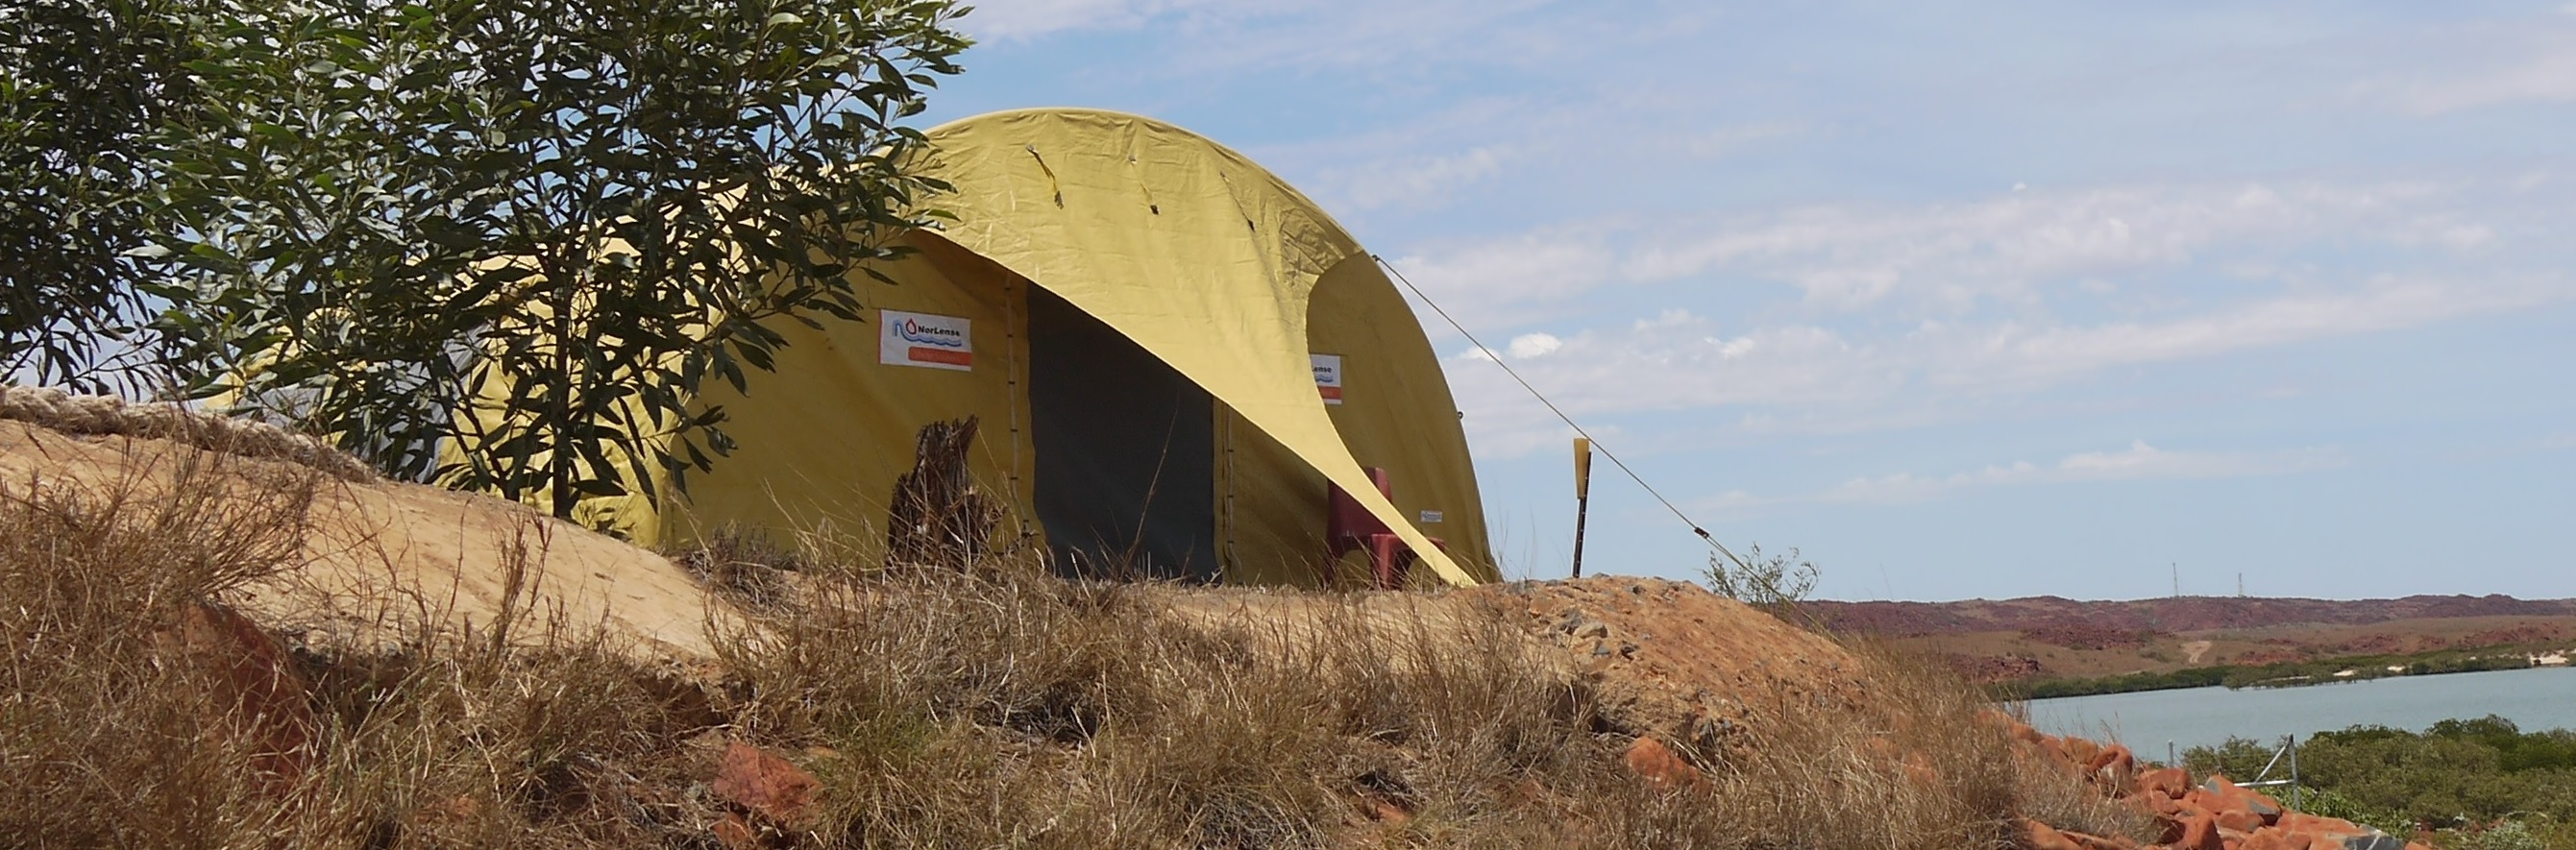 NorLense-Swift-tent-king-bay02